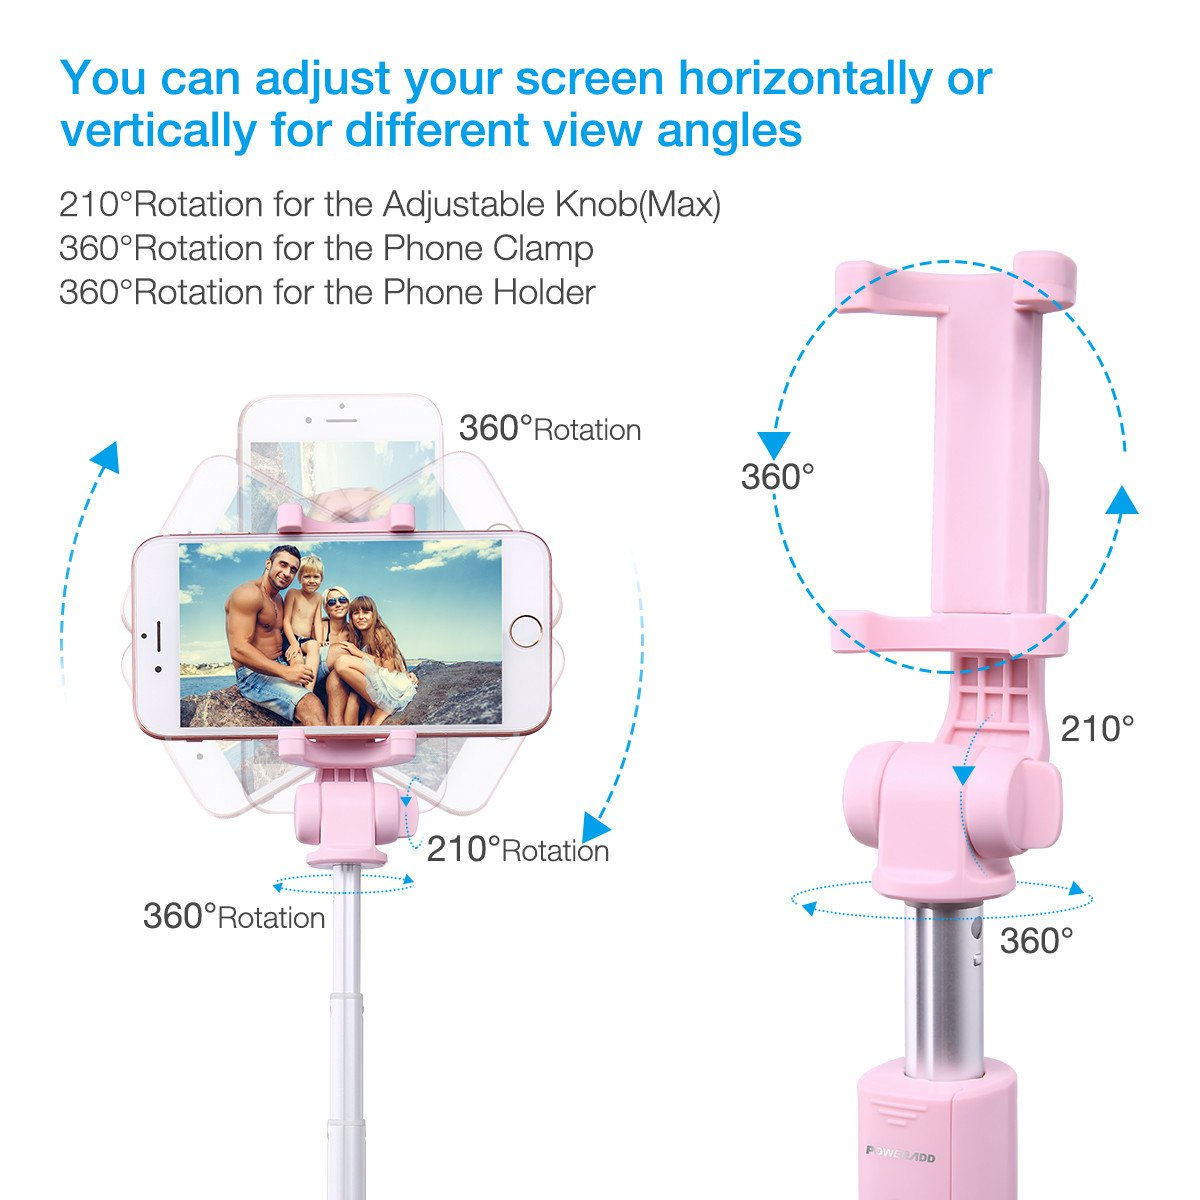 Selfie Stick Tripod,Poweradd Extendable/Foldable Aluminum Selfie Stick with Detachable/Wireless Remote for iPhone X/SE/6/6s/6 Plus/7/7 Plus/8/8 Plus/,Samsung 8/S8/S8 Plus,Nexus,LG,Moto and More-Pink by POWERADD (Image #4)